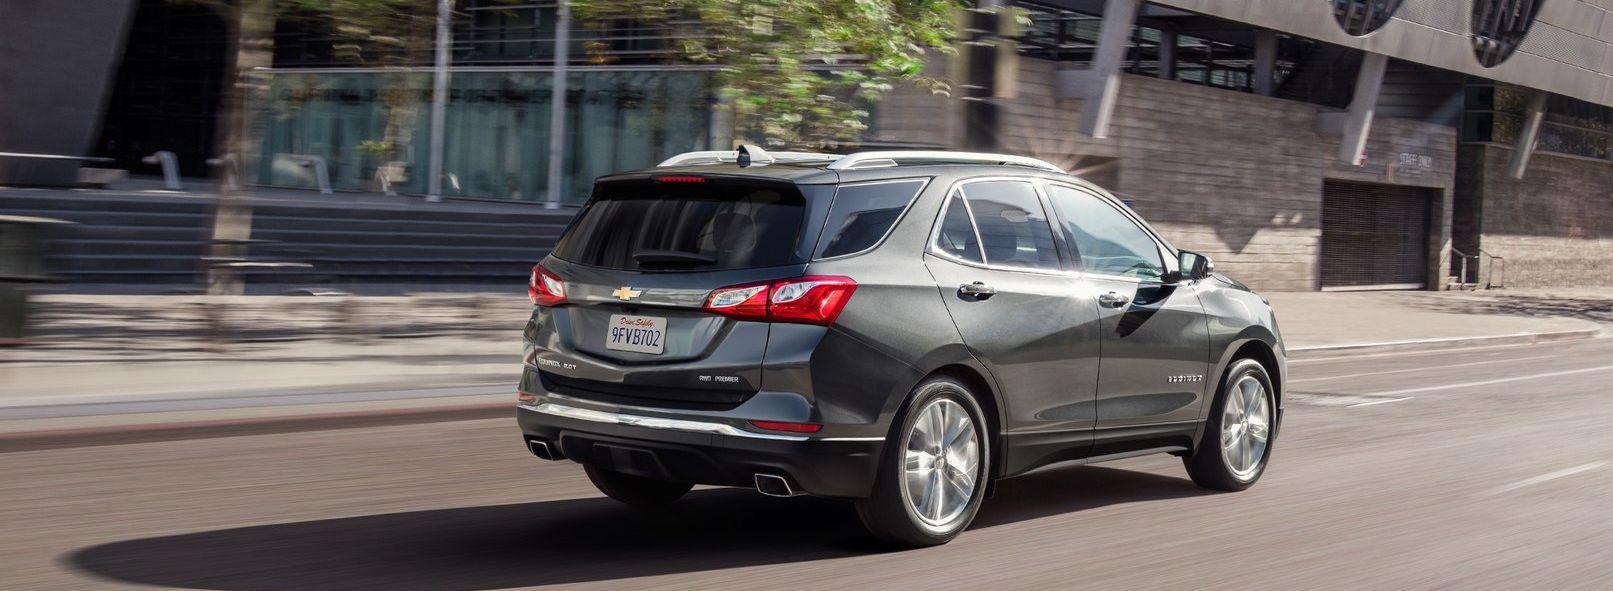 2019 Chevrolet Equinox for Sale near Lansing, MI